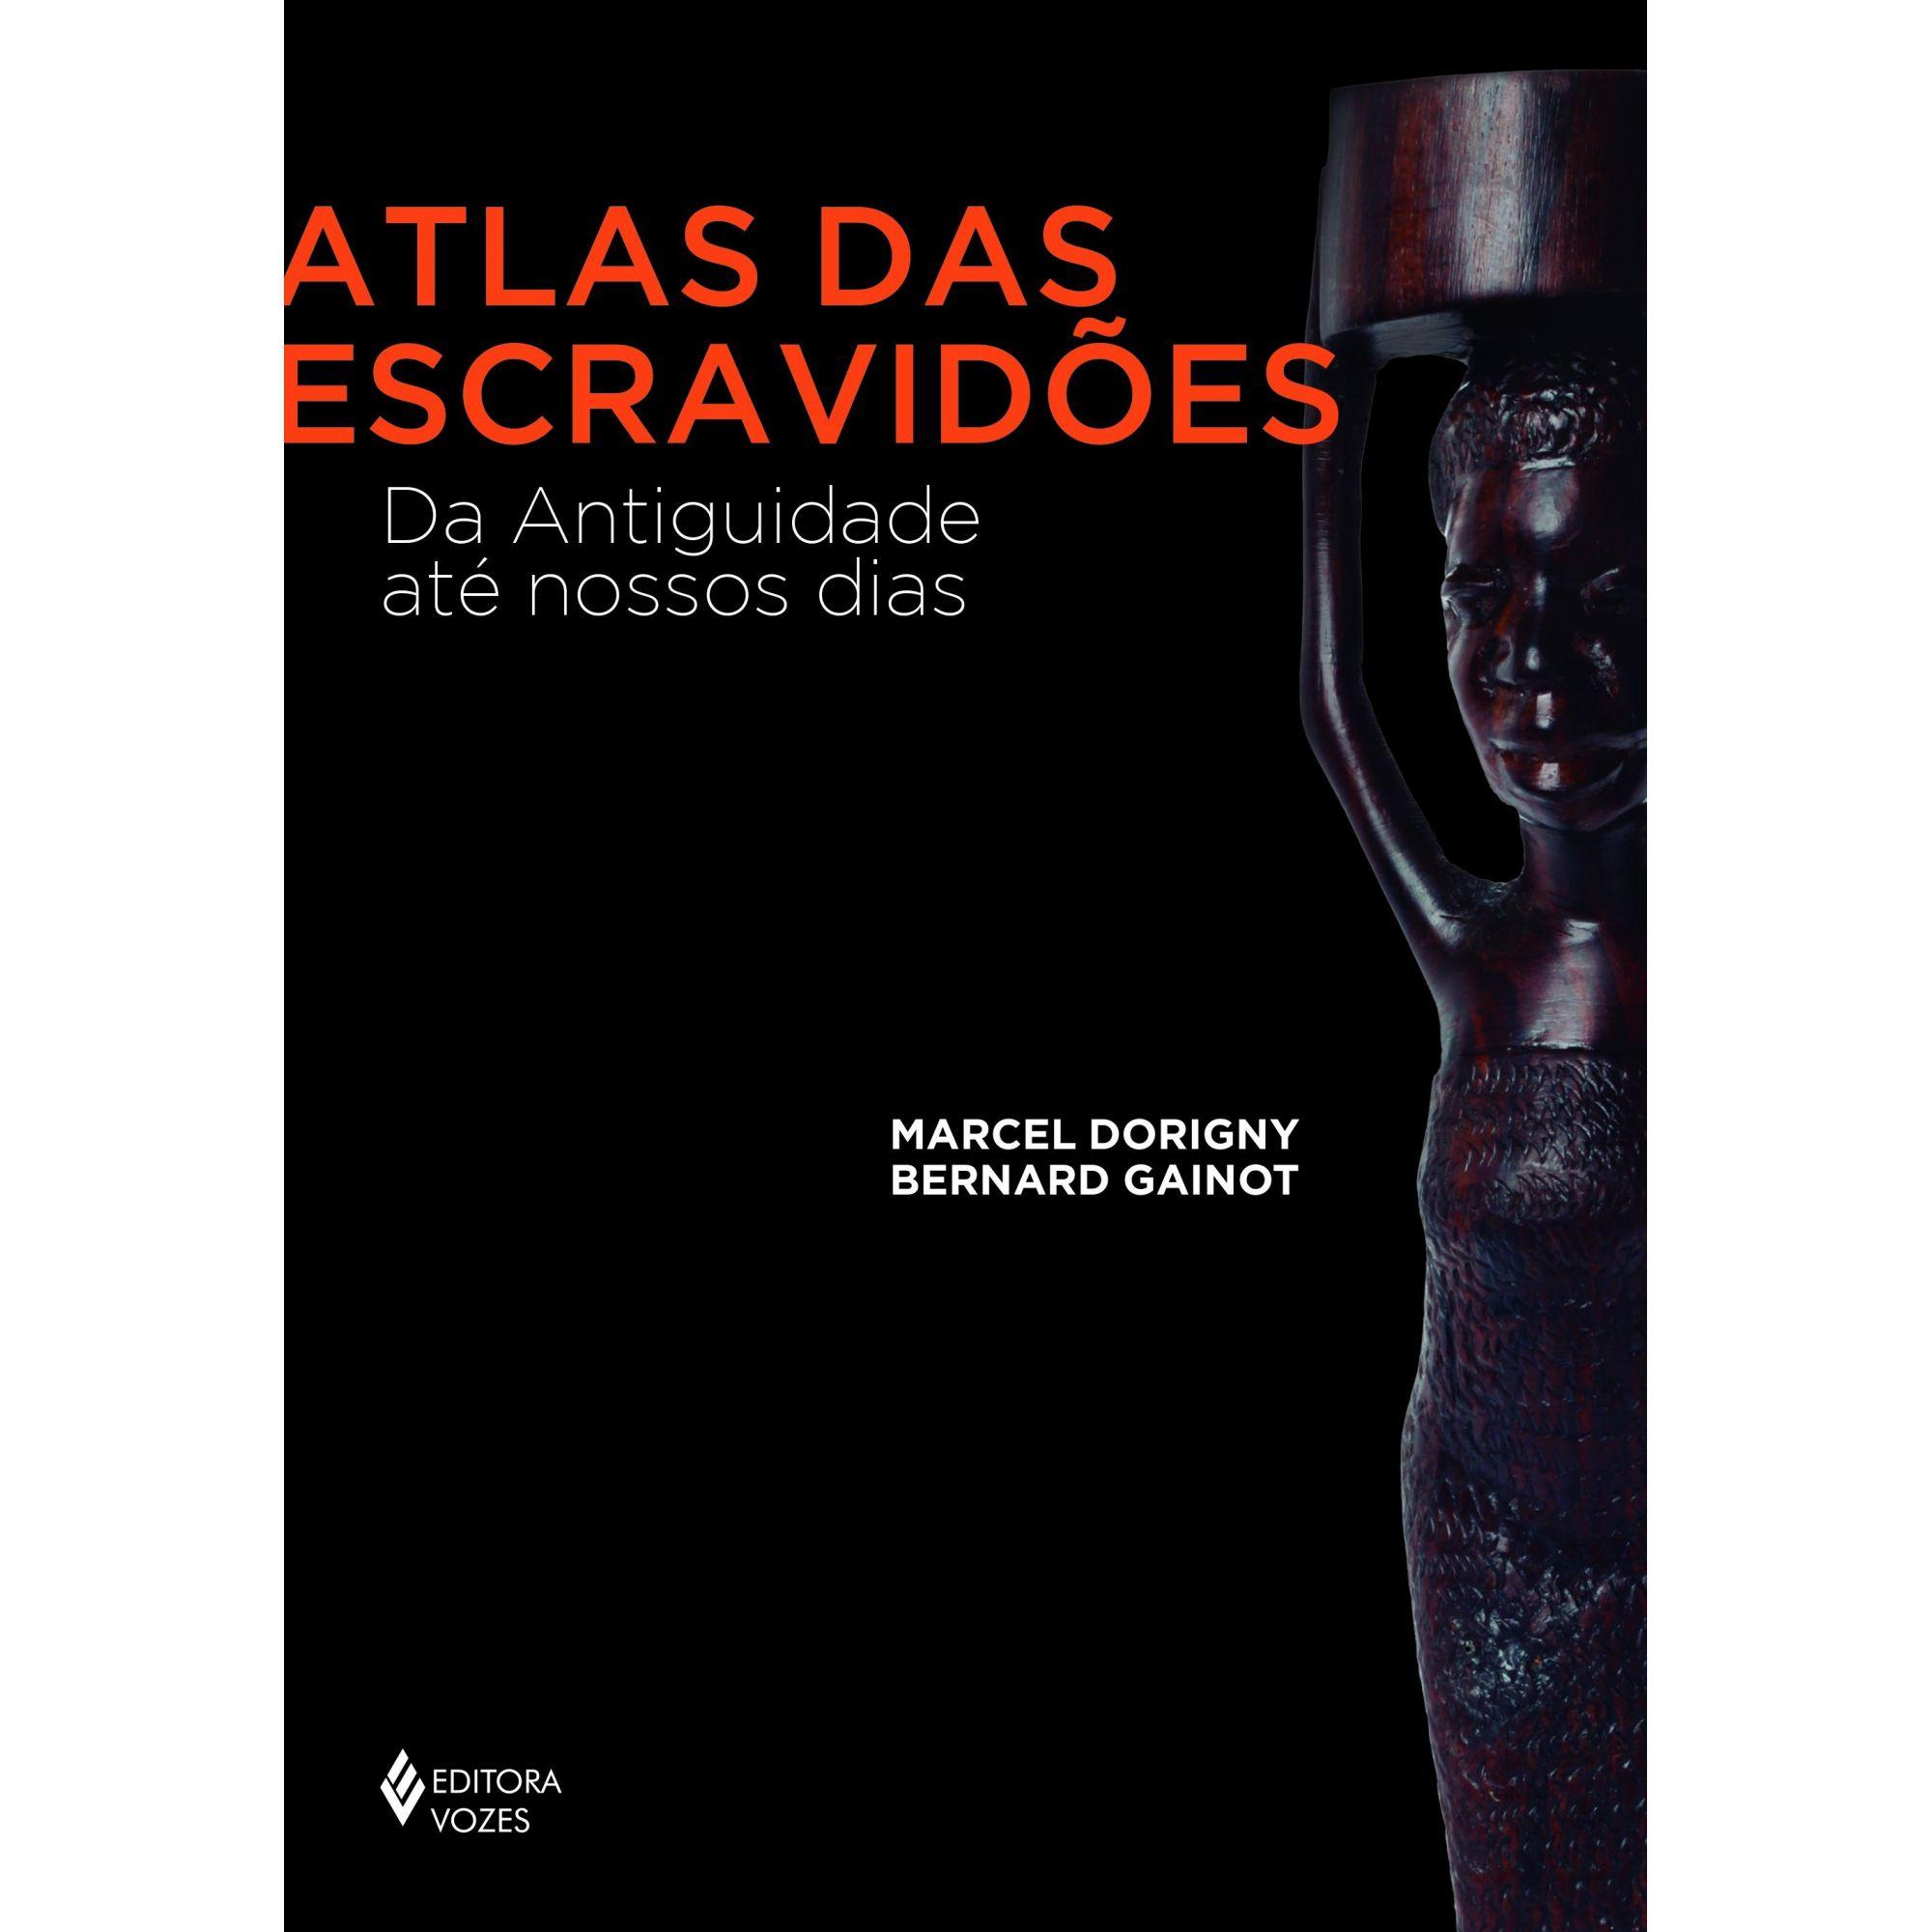 Atlas das escravidões